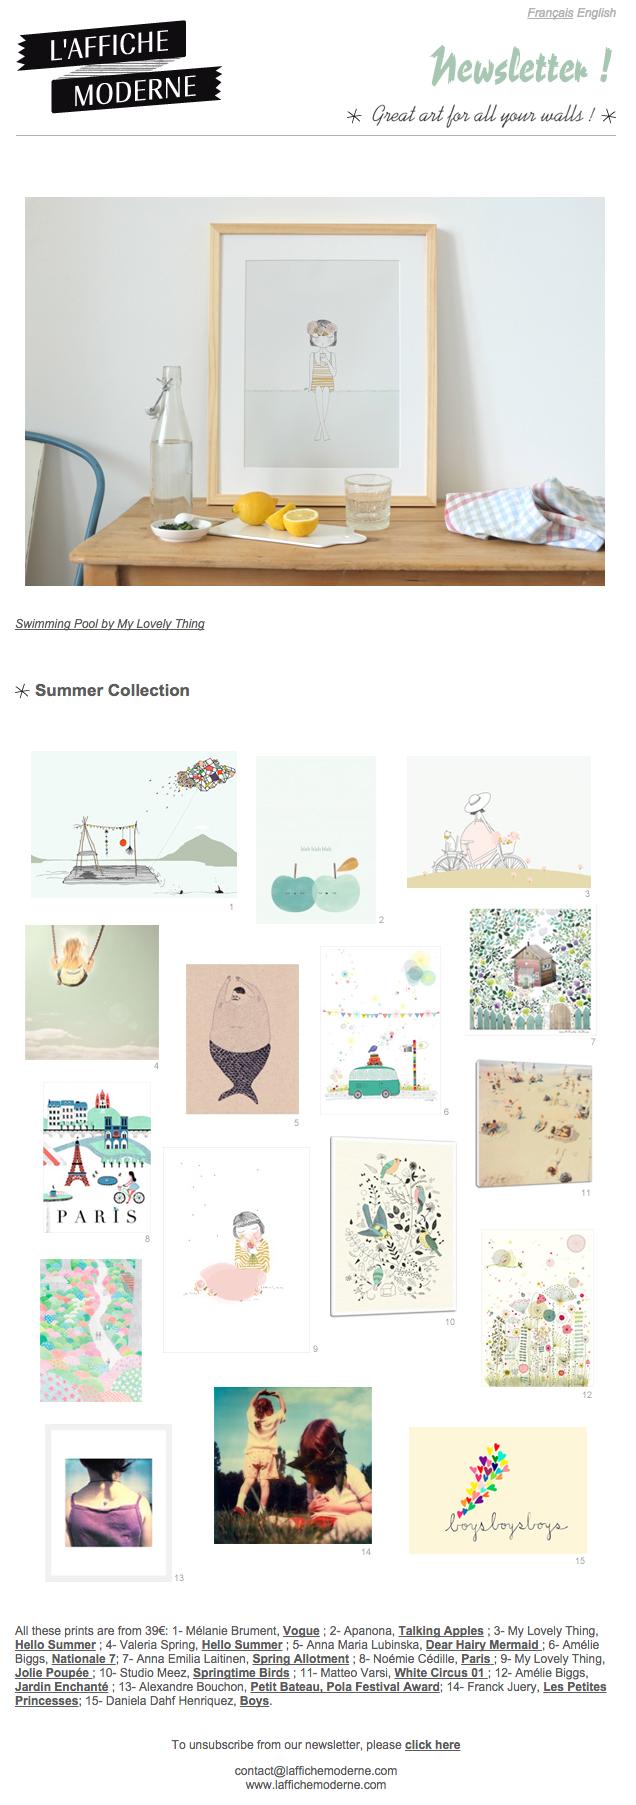 L'Affiche Moderne – Summer Collection - Inspiring newsletter #Design #Art #Newsletter #Ecommerce